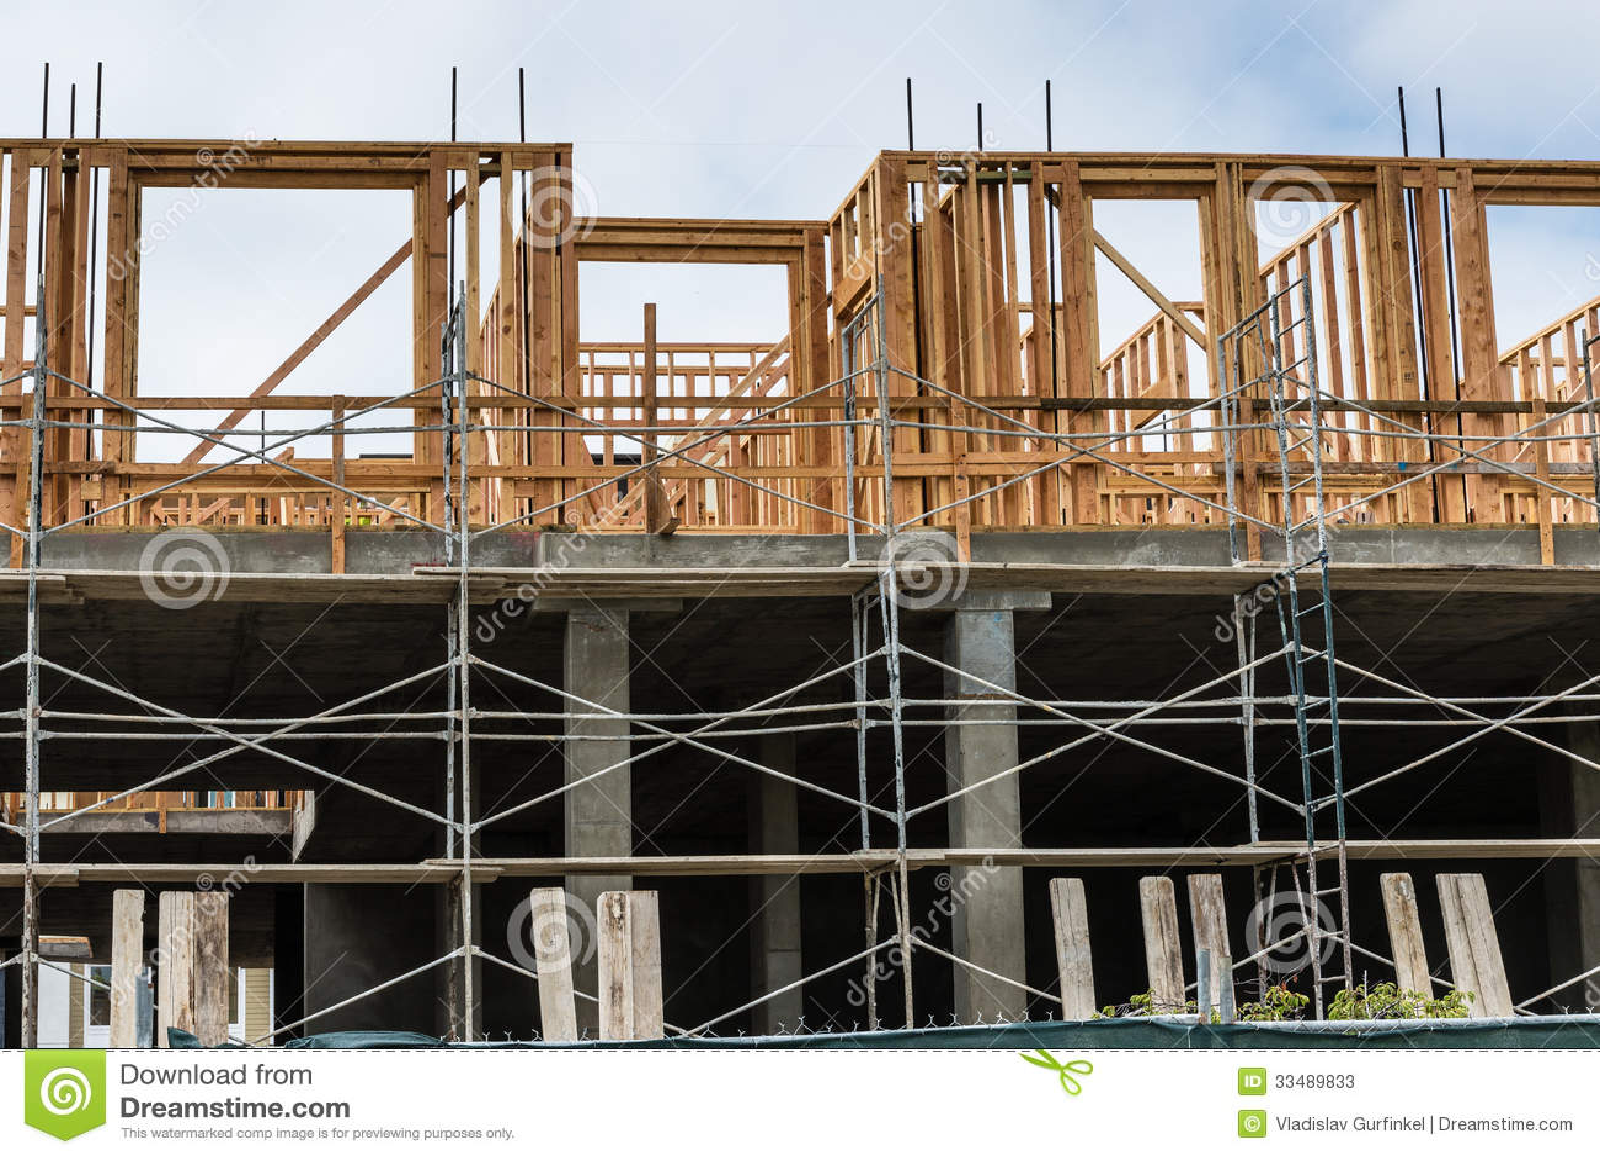 Apartment Building Construction new apartment building construction site stock photos - image